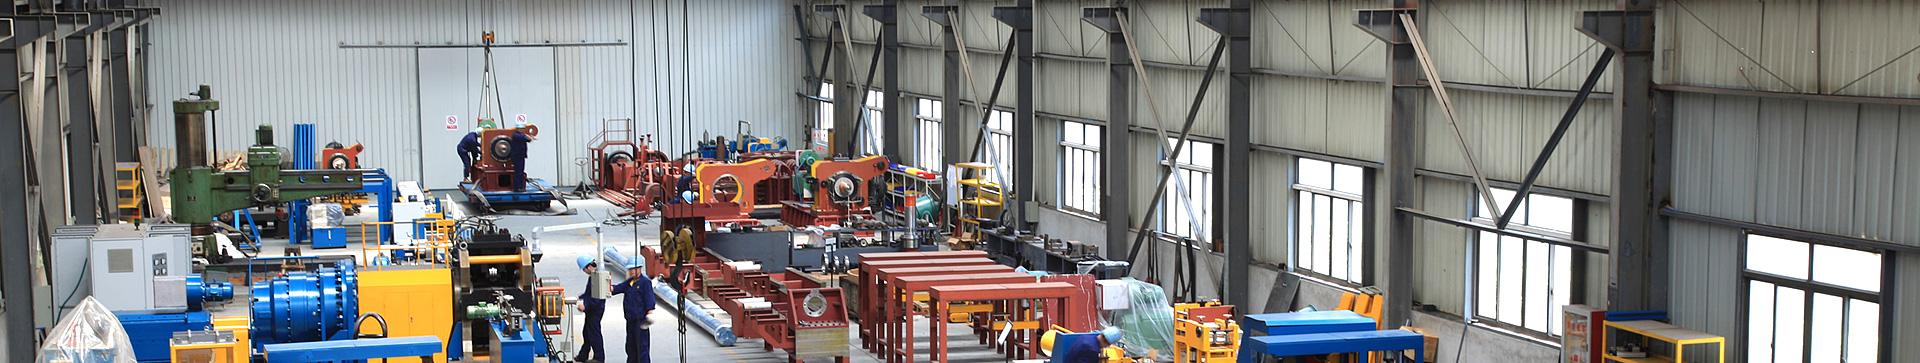 Industries